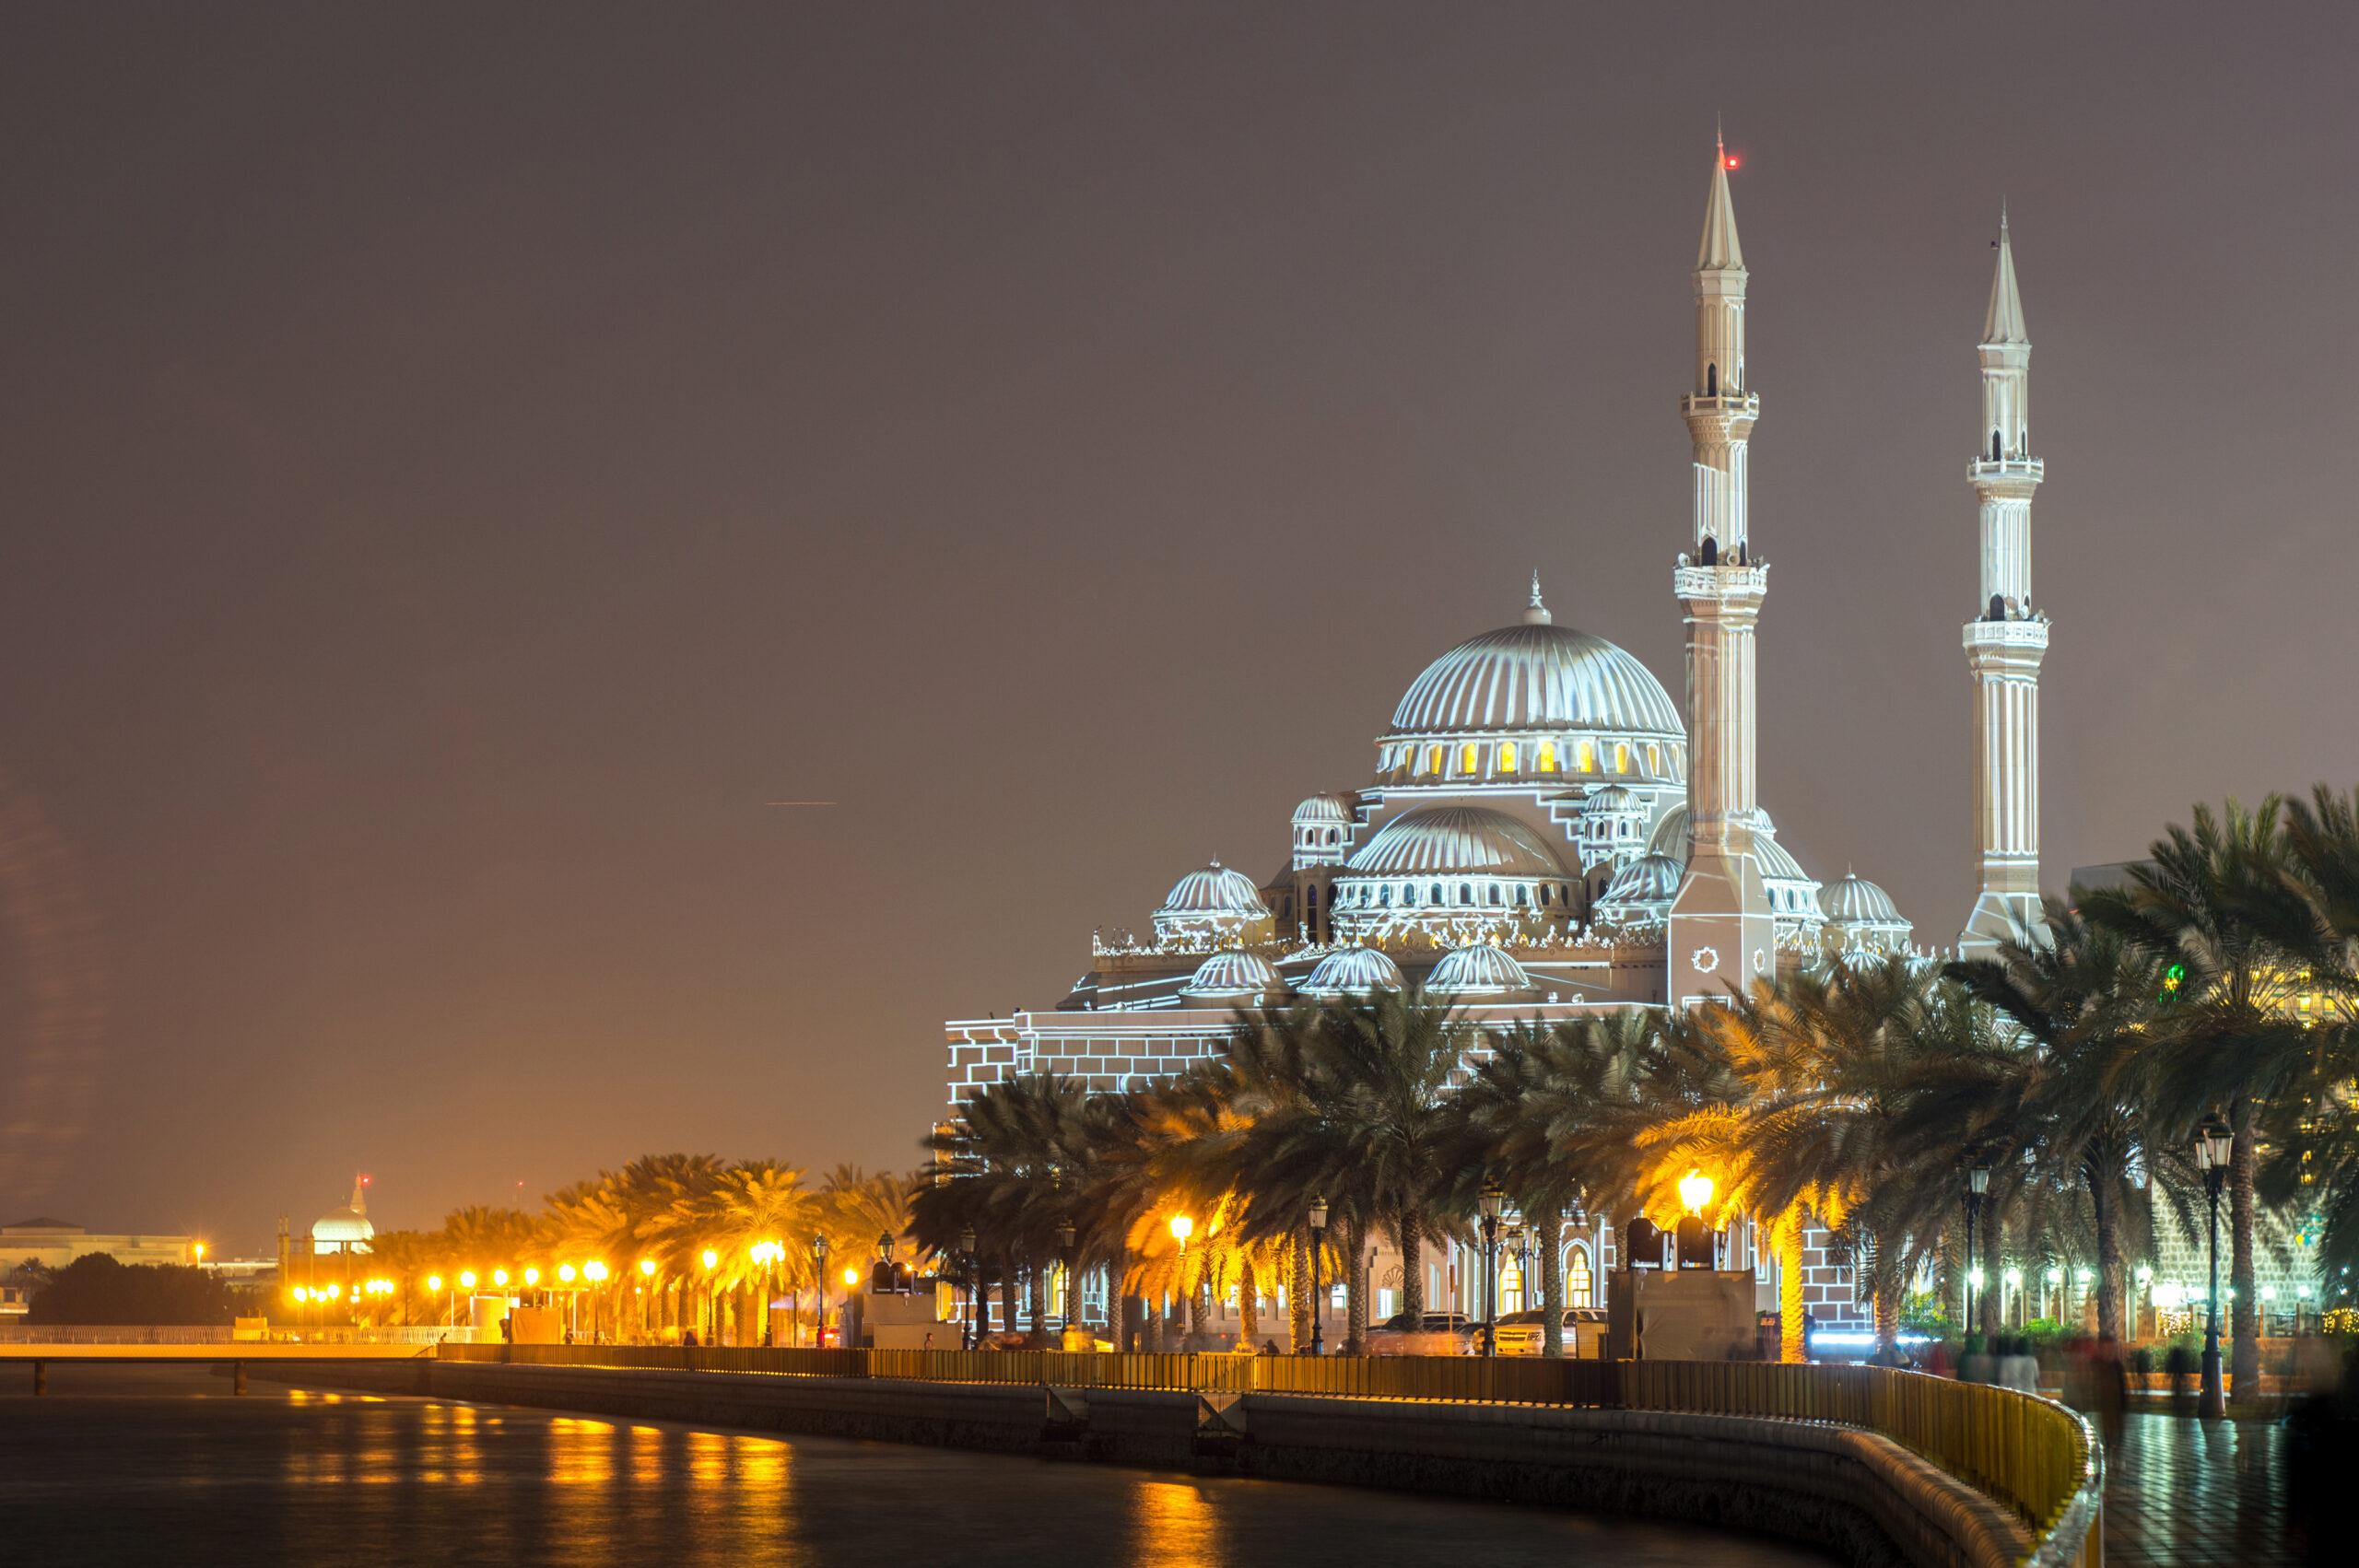 Ne pas sortir de la mosquée sans excuse apres Al-Adhan